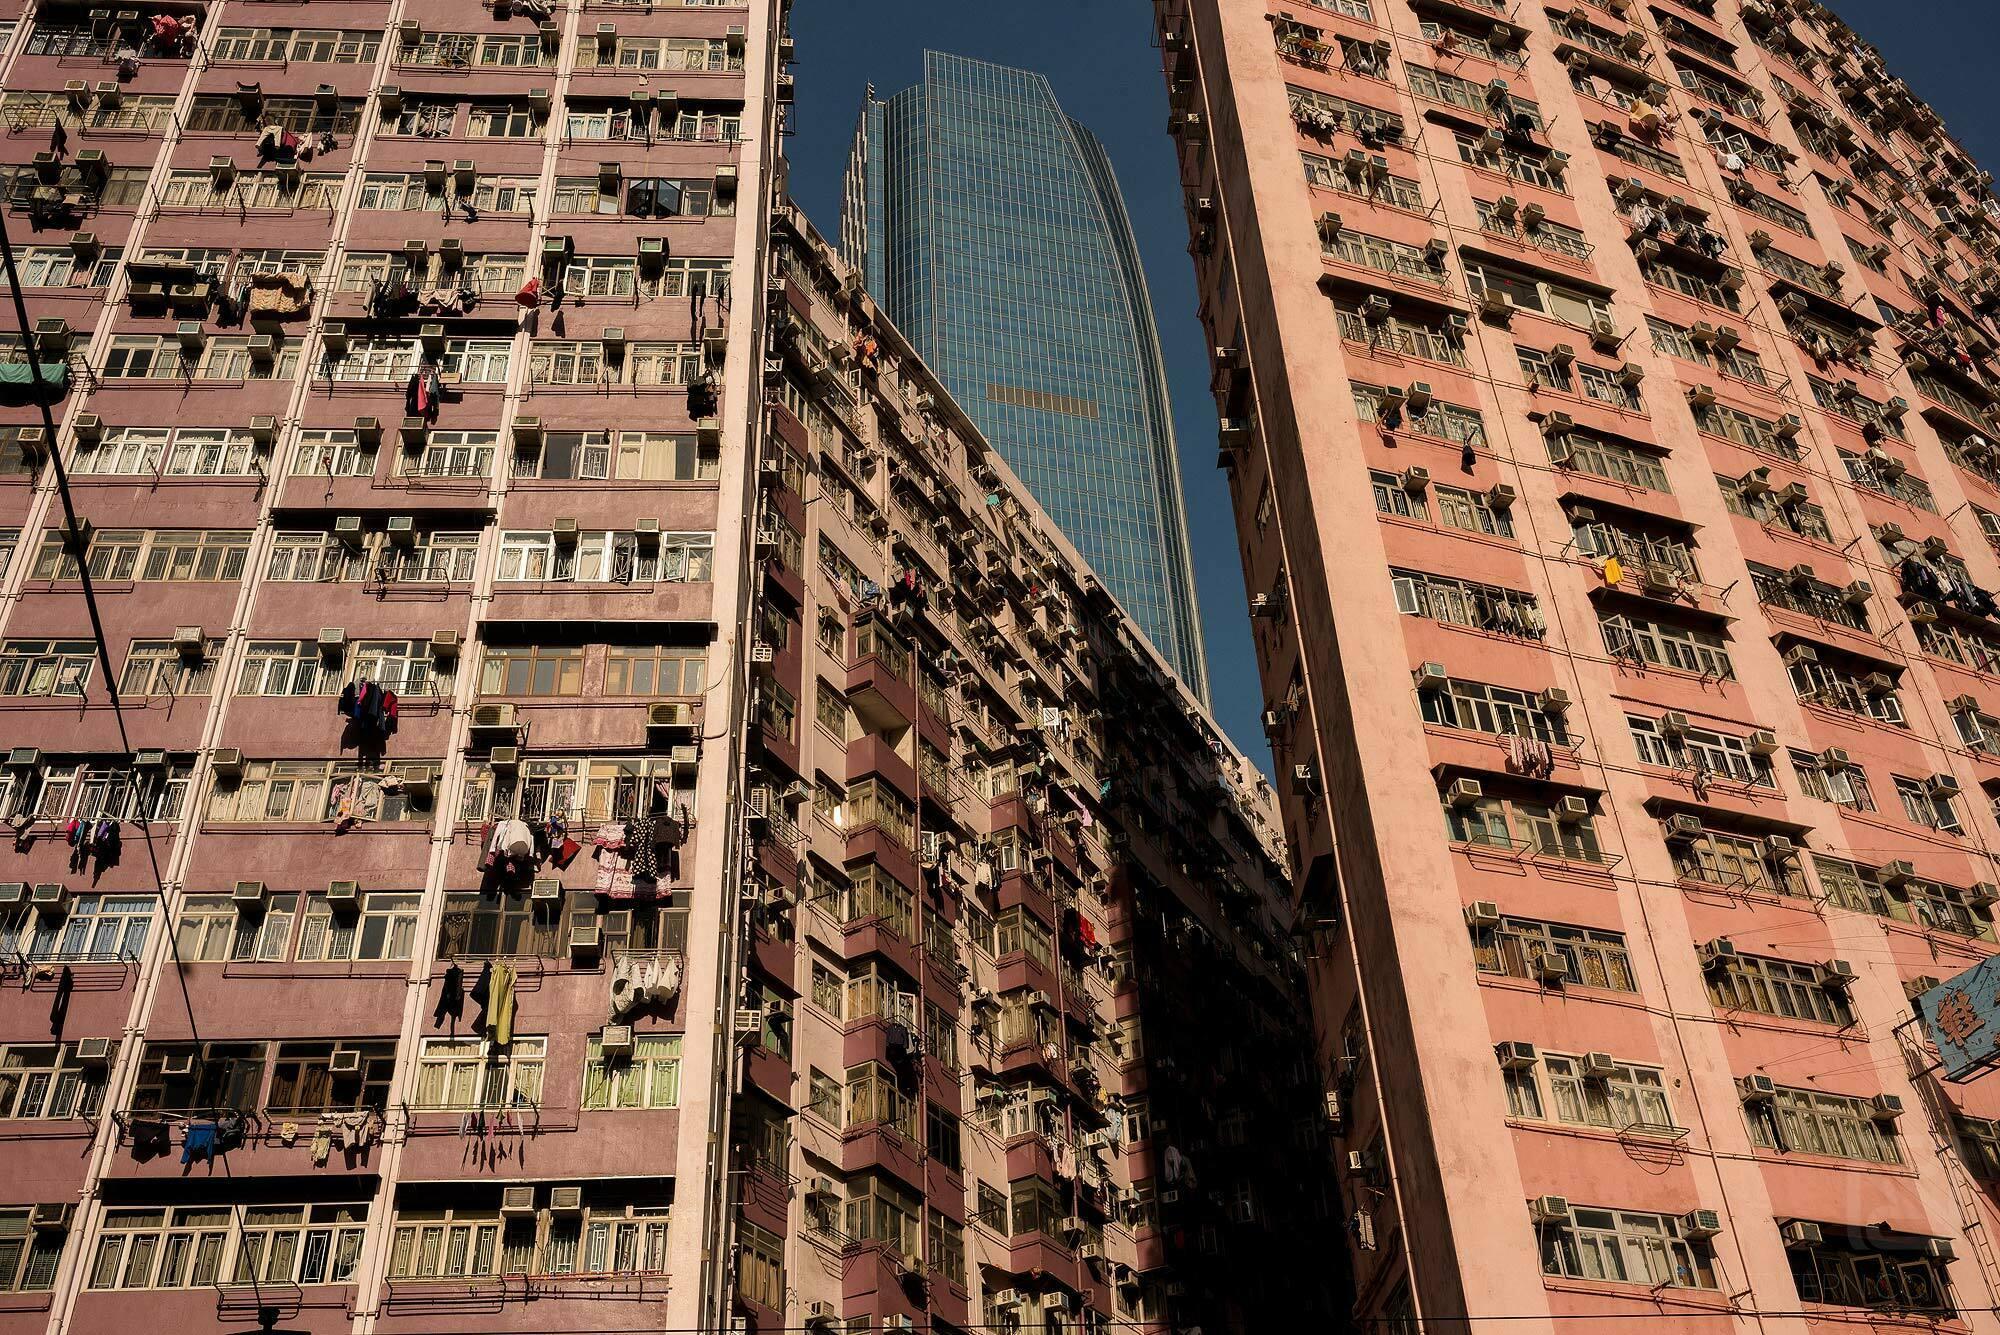 Buildings in Quarry Bay area of Hong Kong